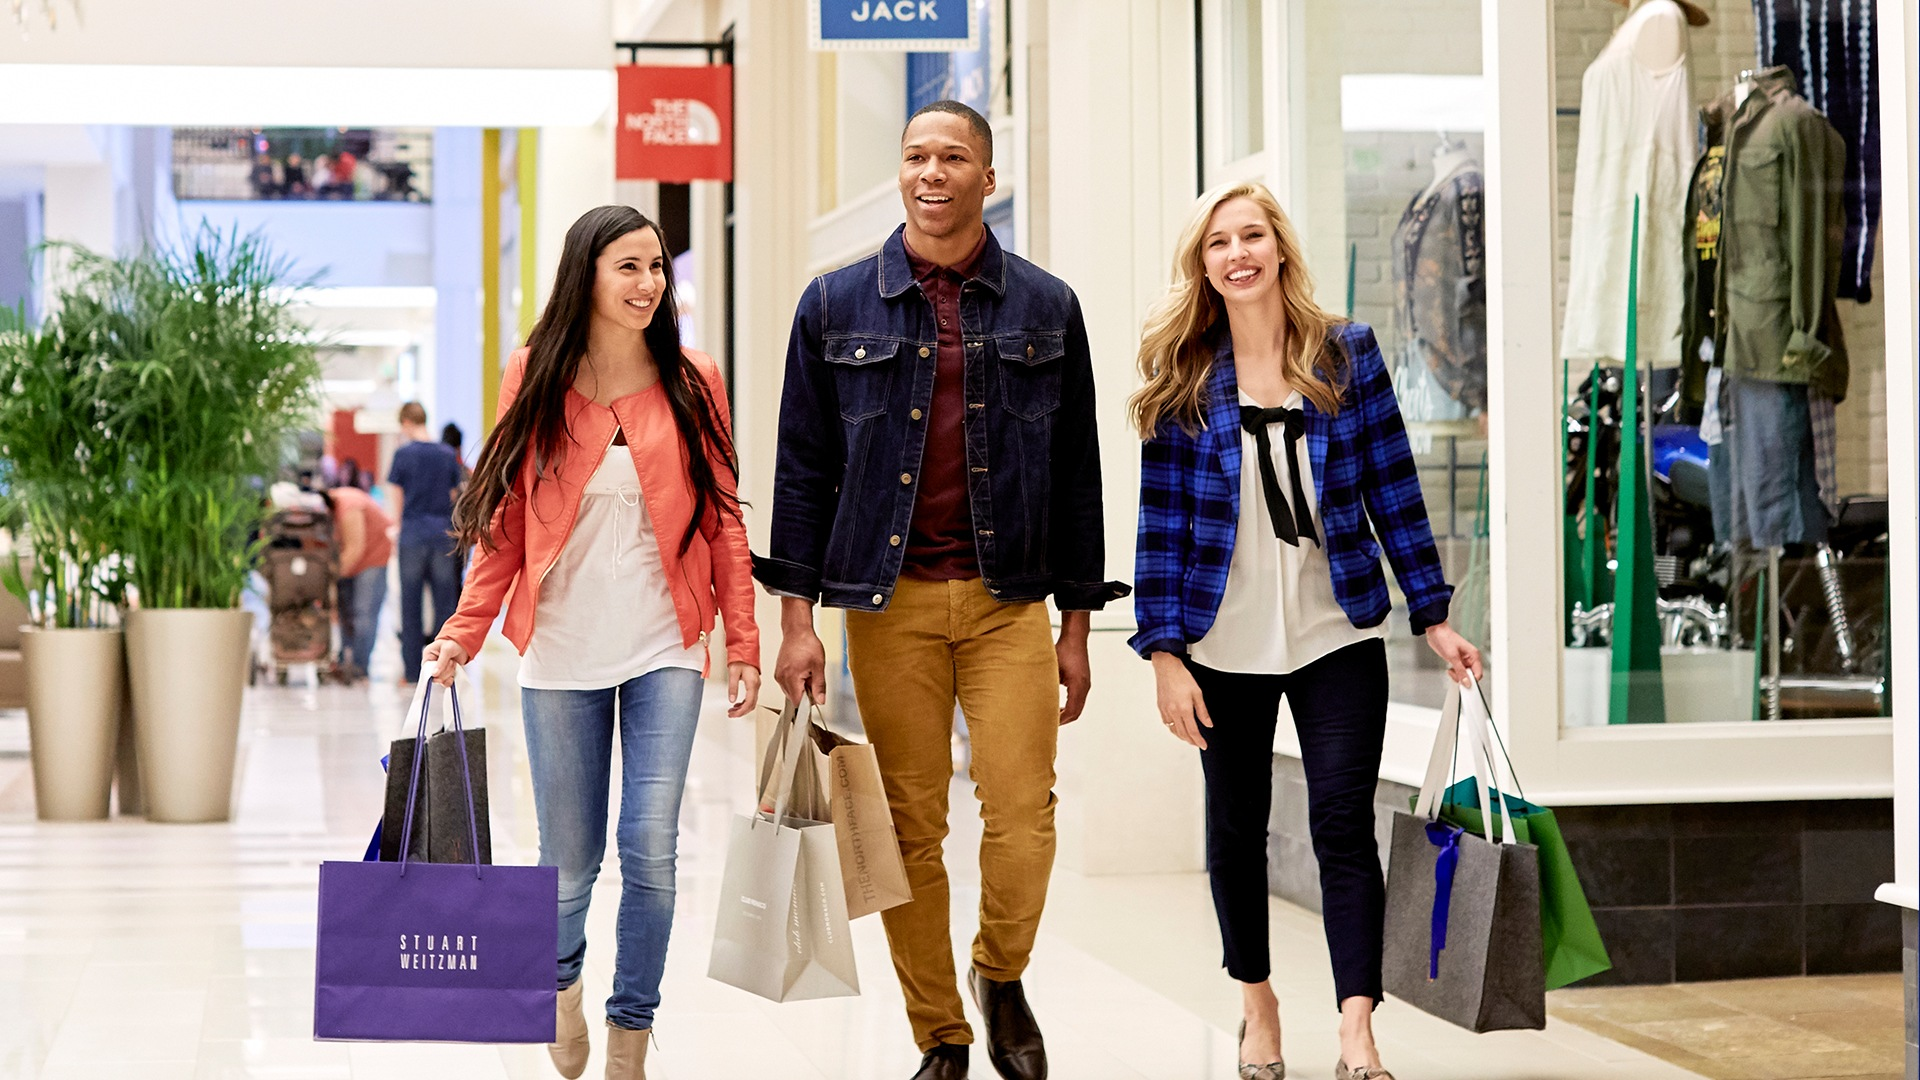 Shopping Mall Of America